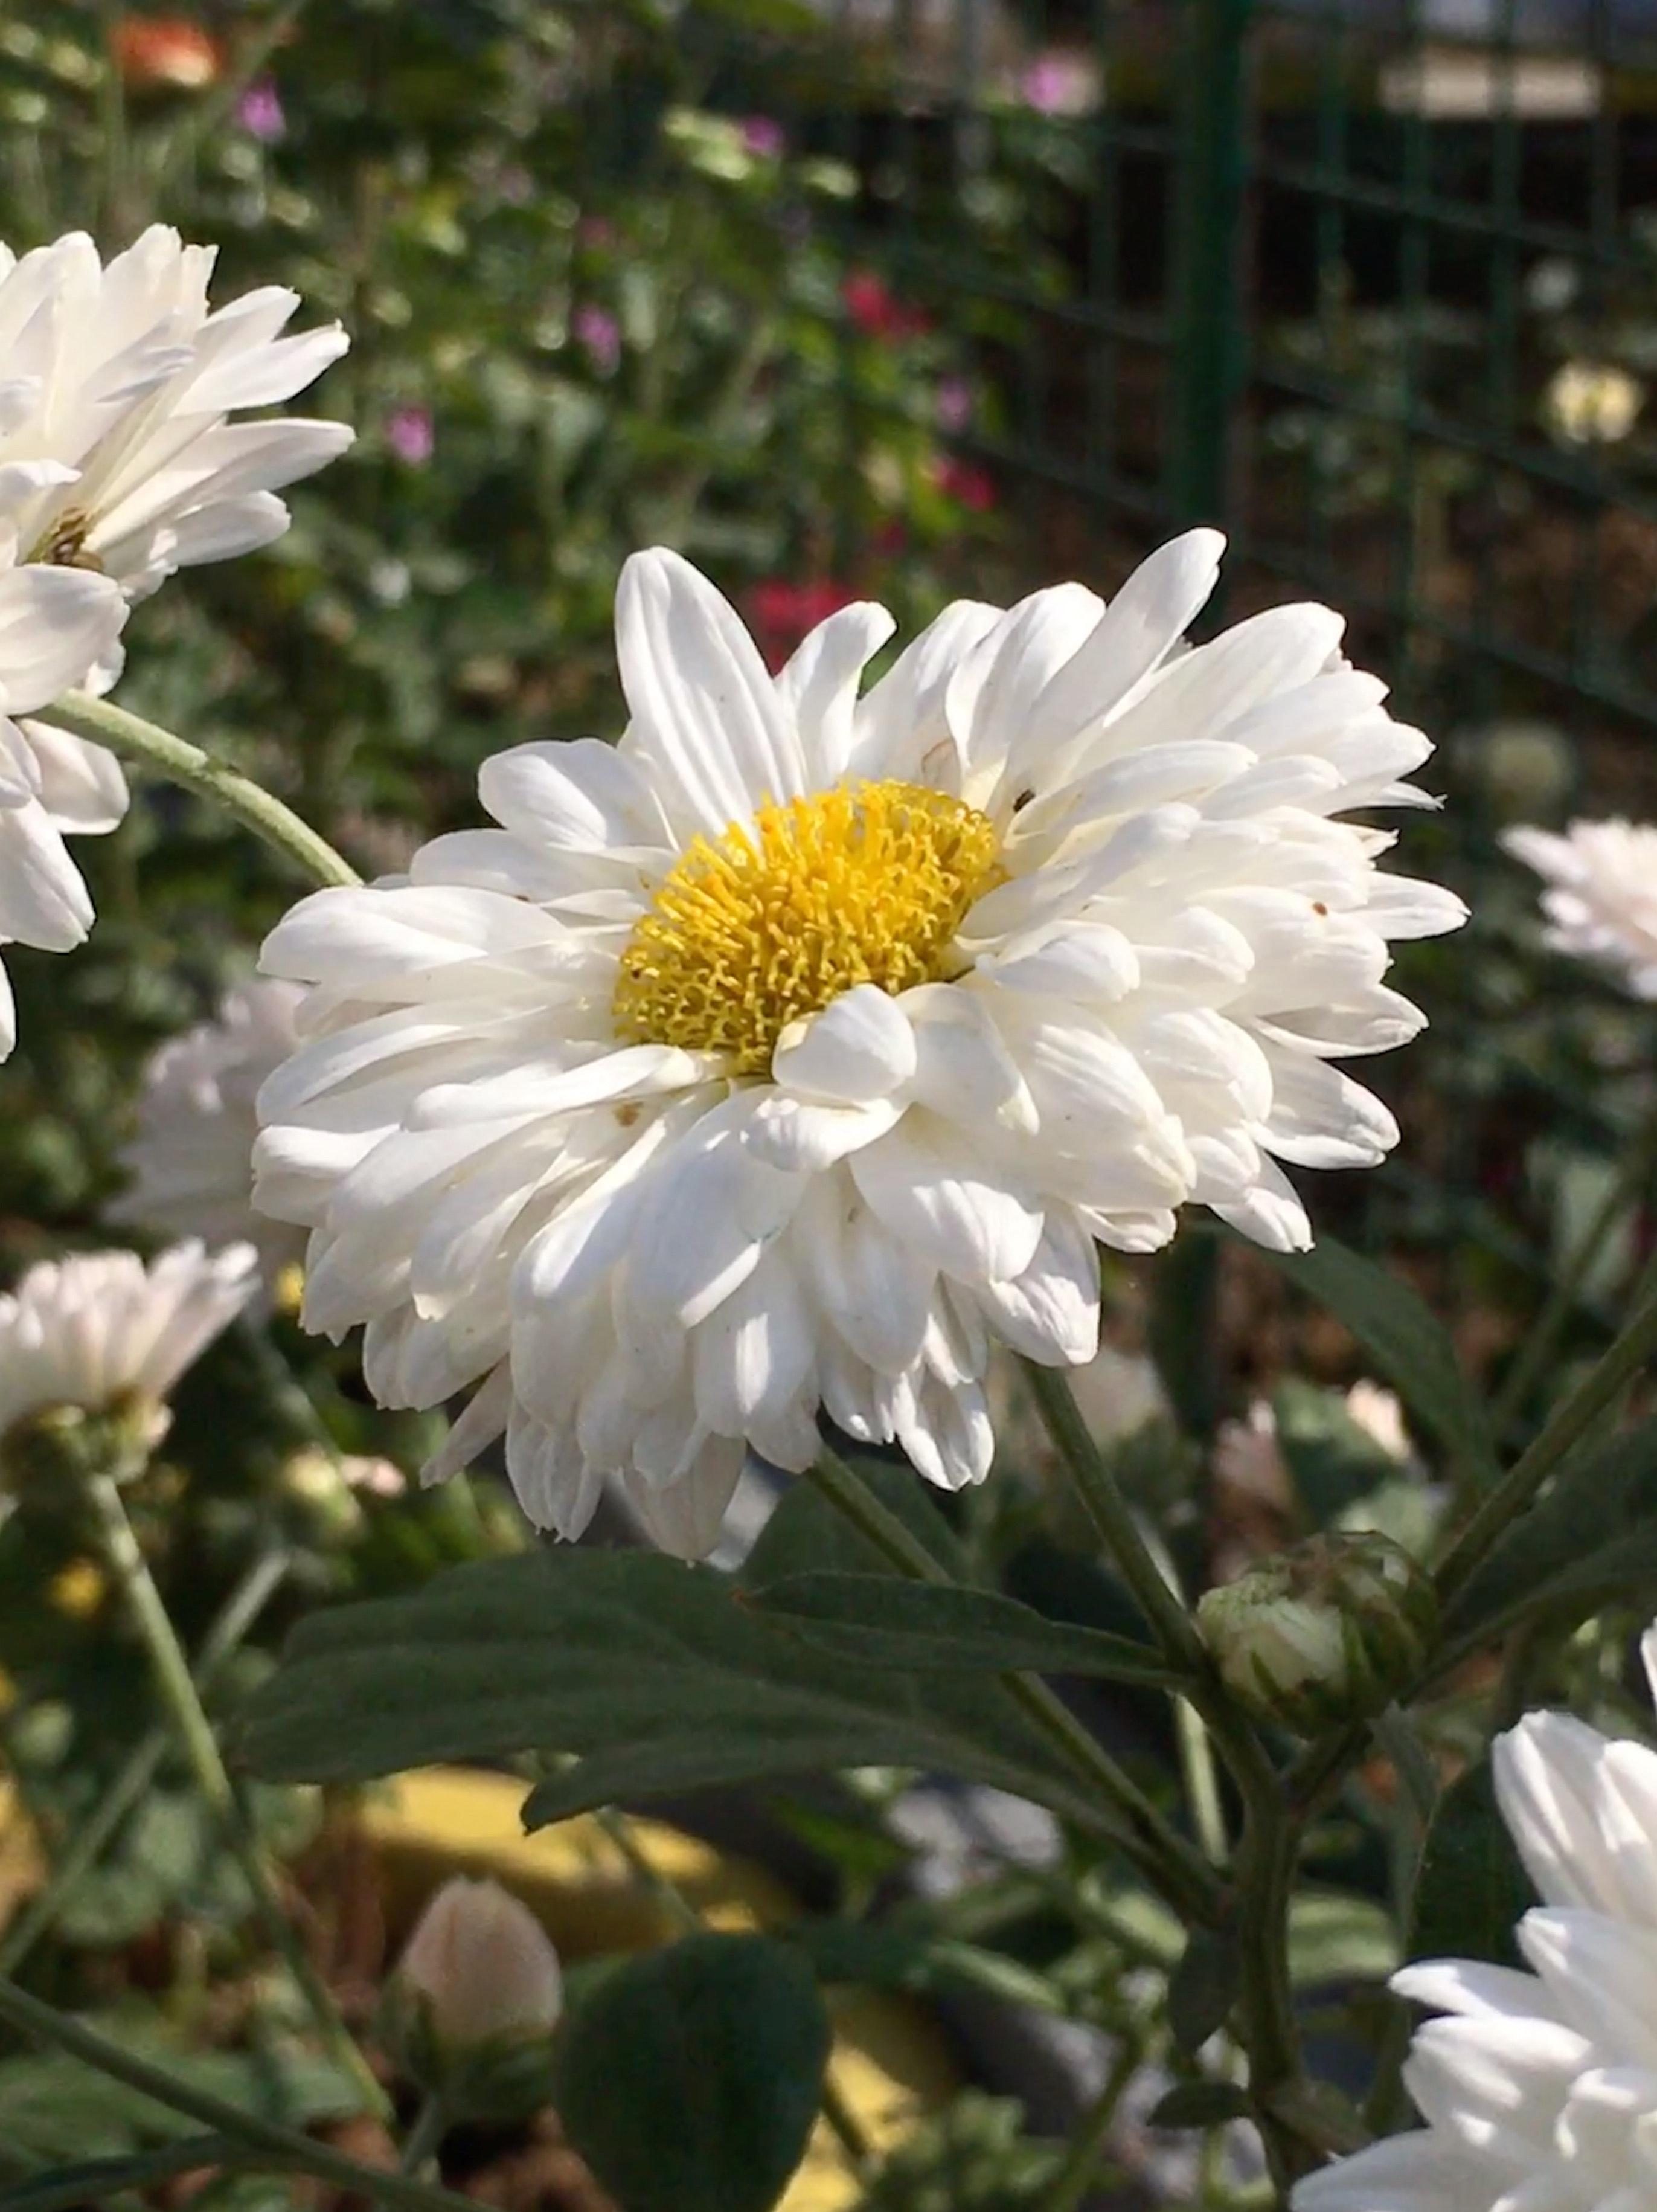 Free stock photo of beautiful garden flower in garden white flower free download izmirmasajfo